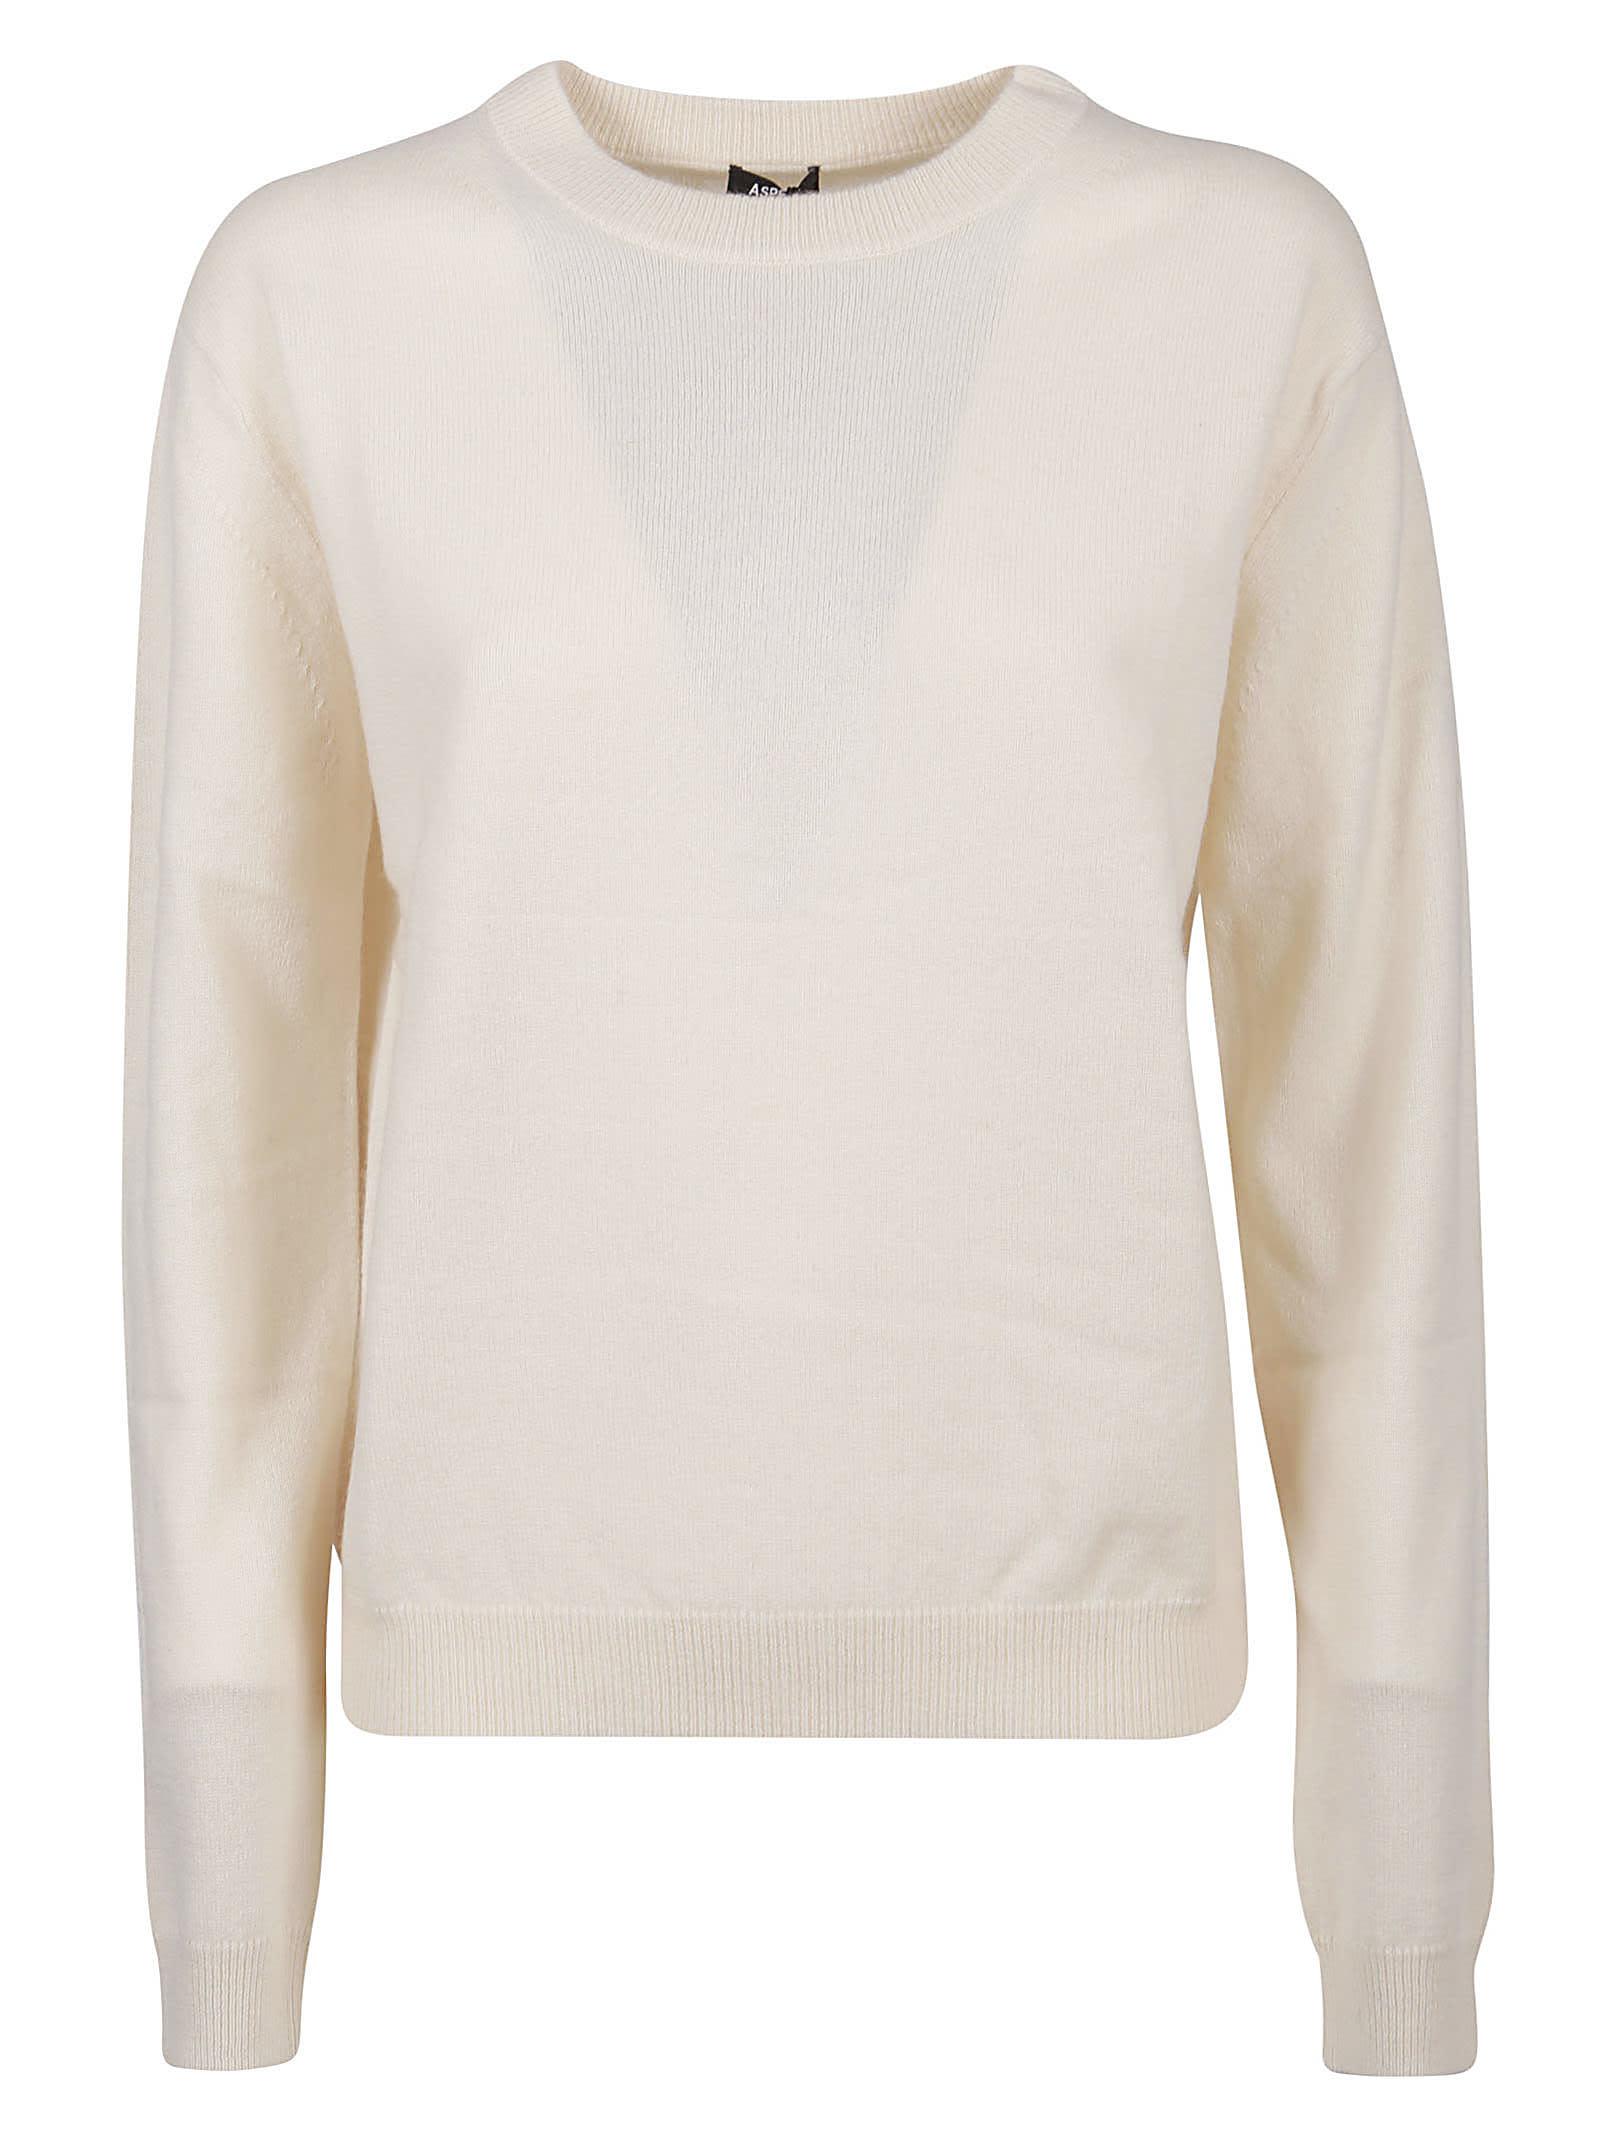 Aspesi Plain Ribbed Sweater